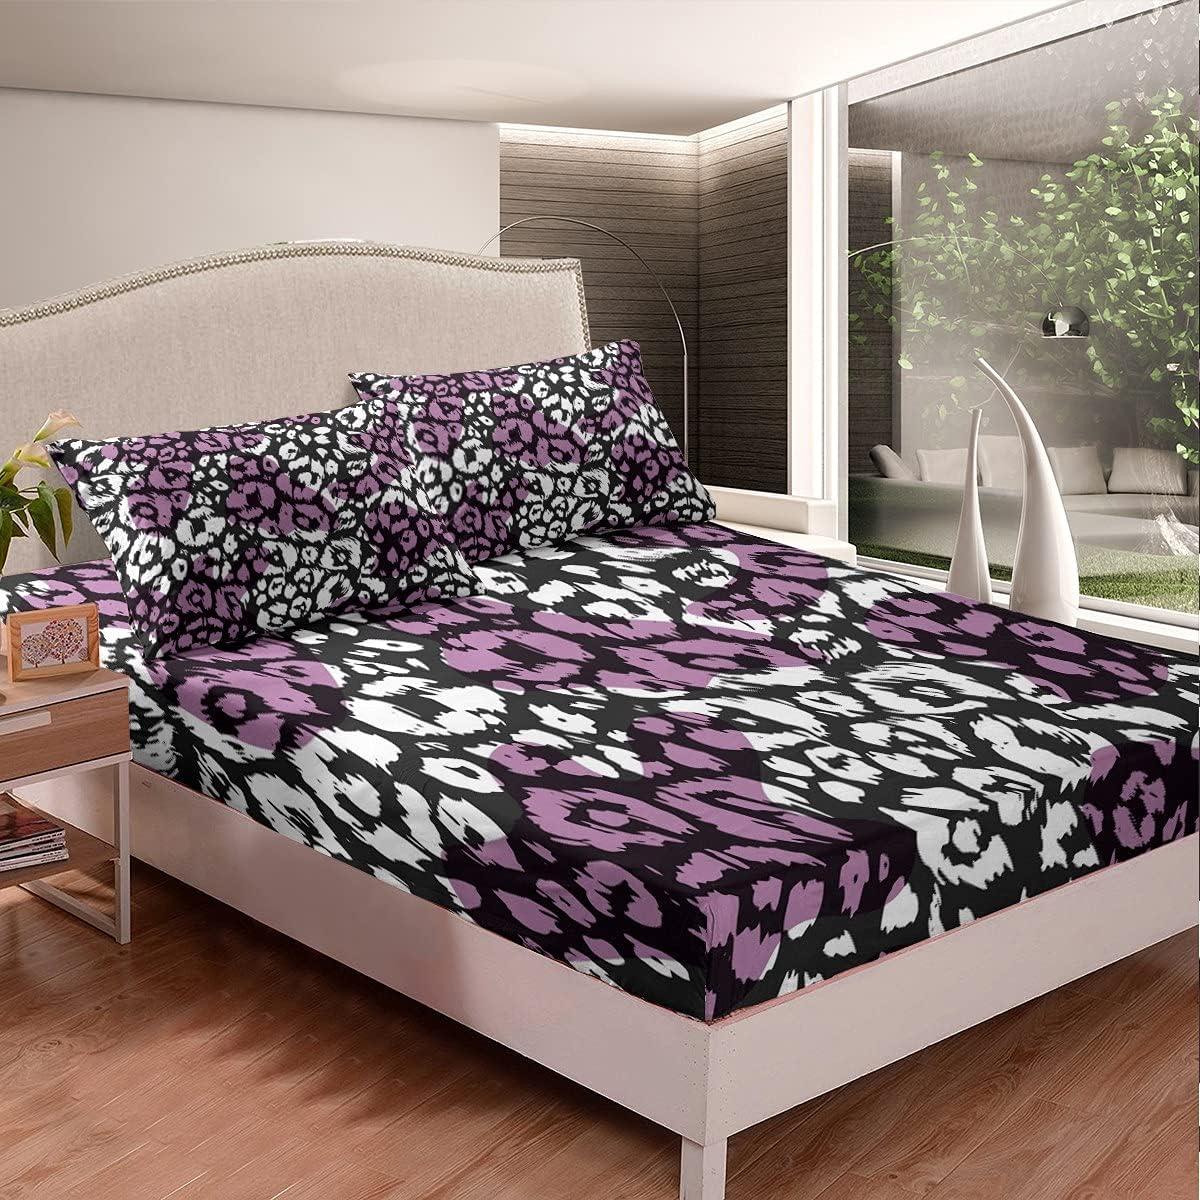 Ranking TOP10 Erosebridal Ranking TOP16 Leopard Fitted Sheet Purple Black Cheetah Skin Print